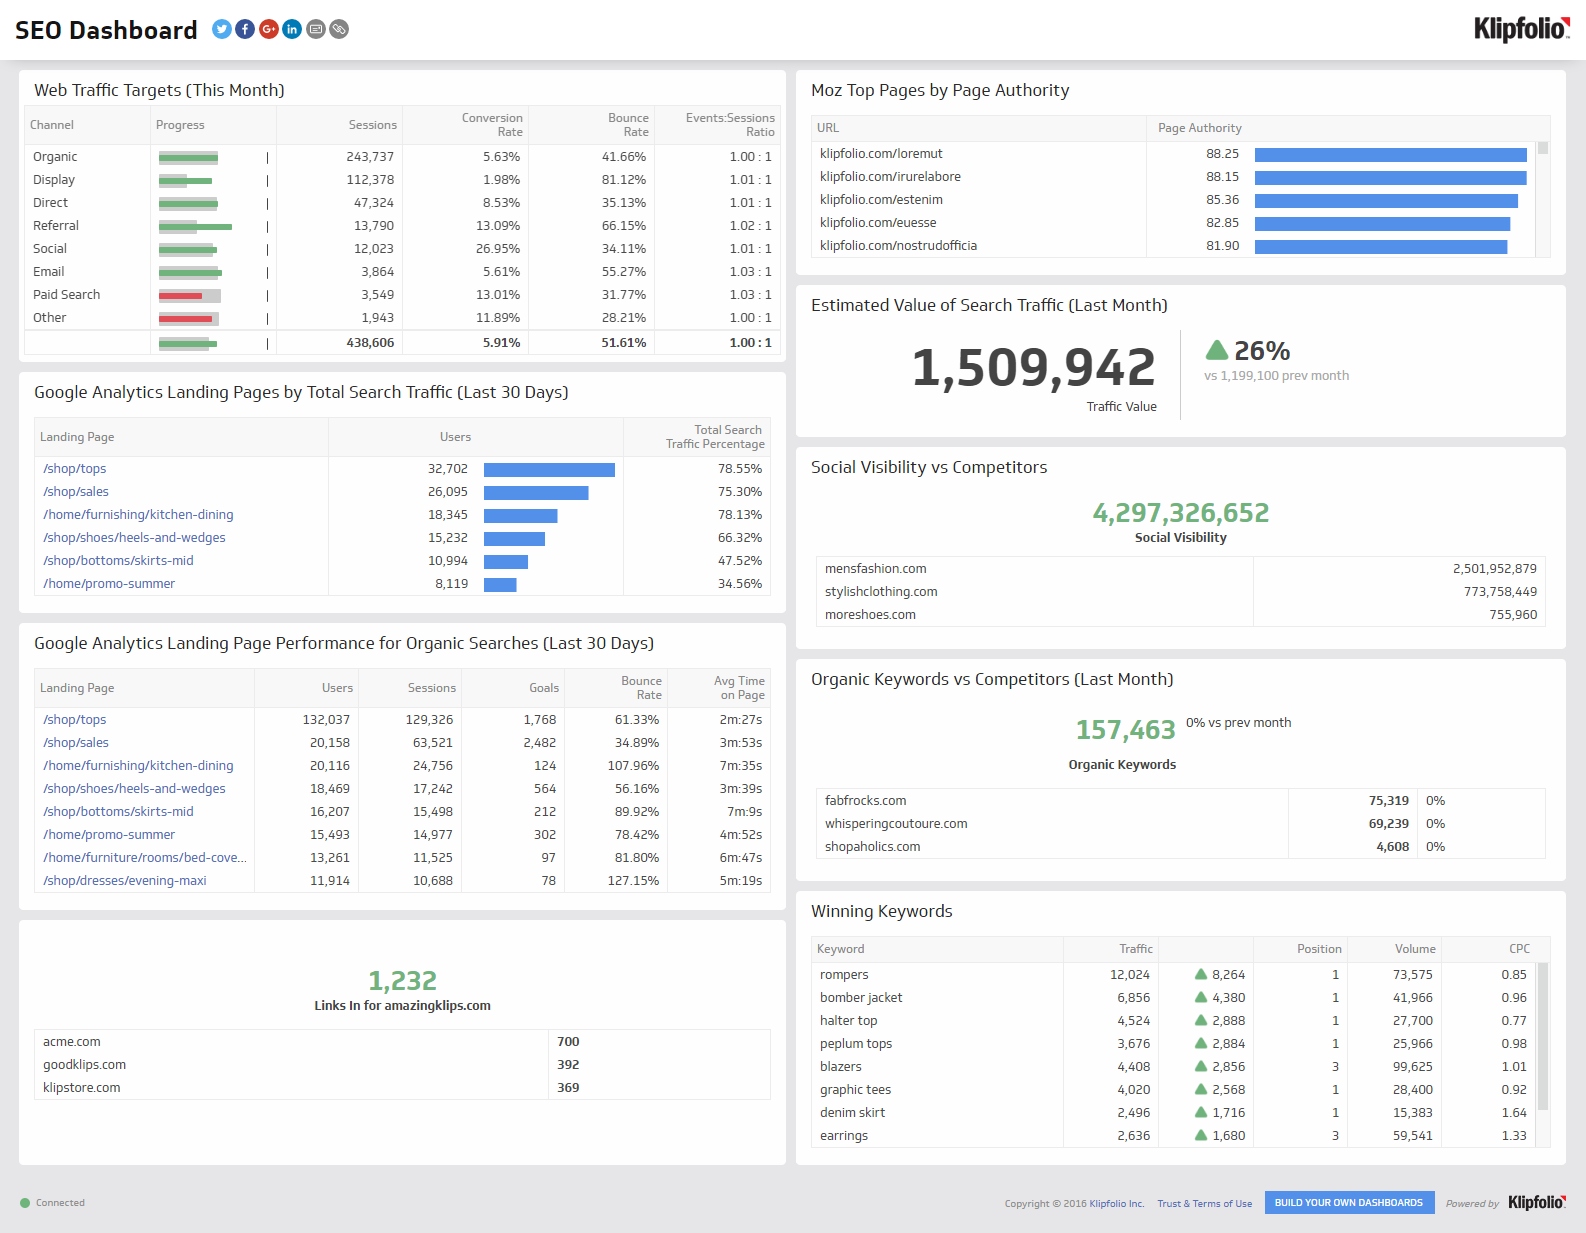 SEO Analytics Dashboard Screenshot